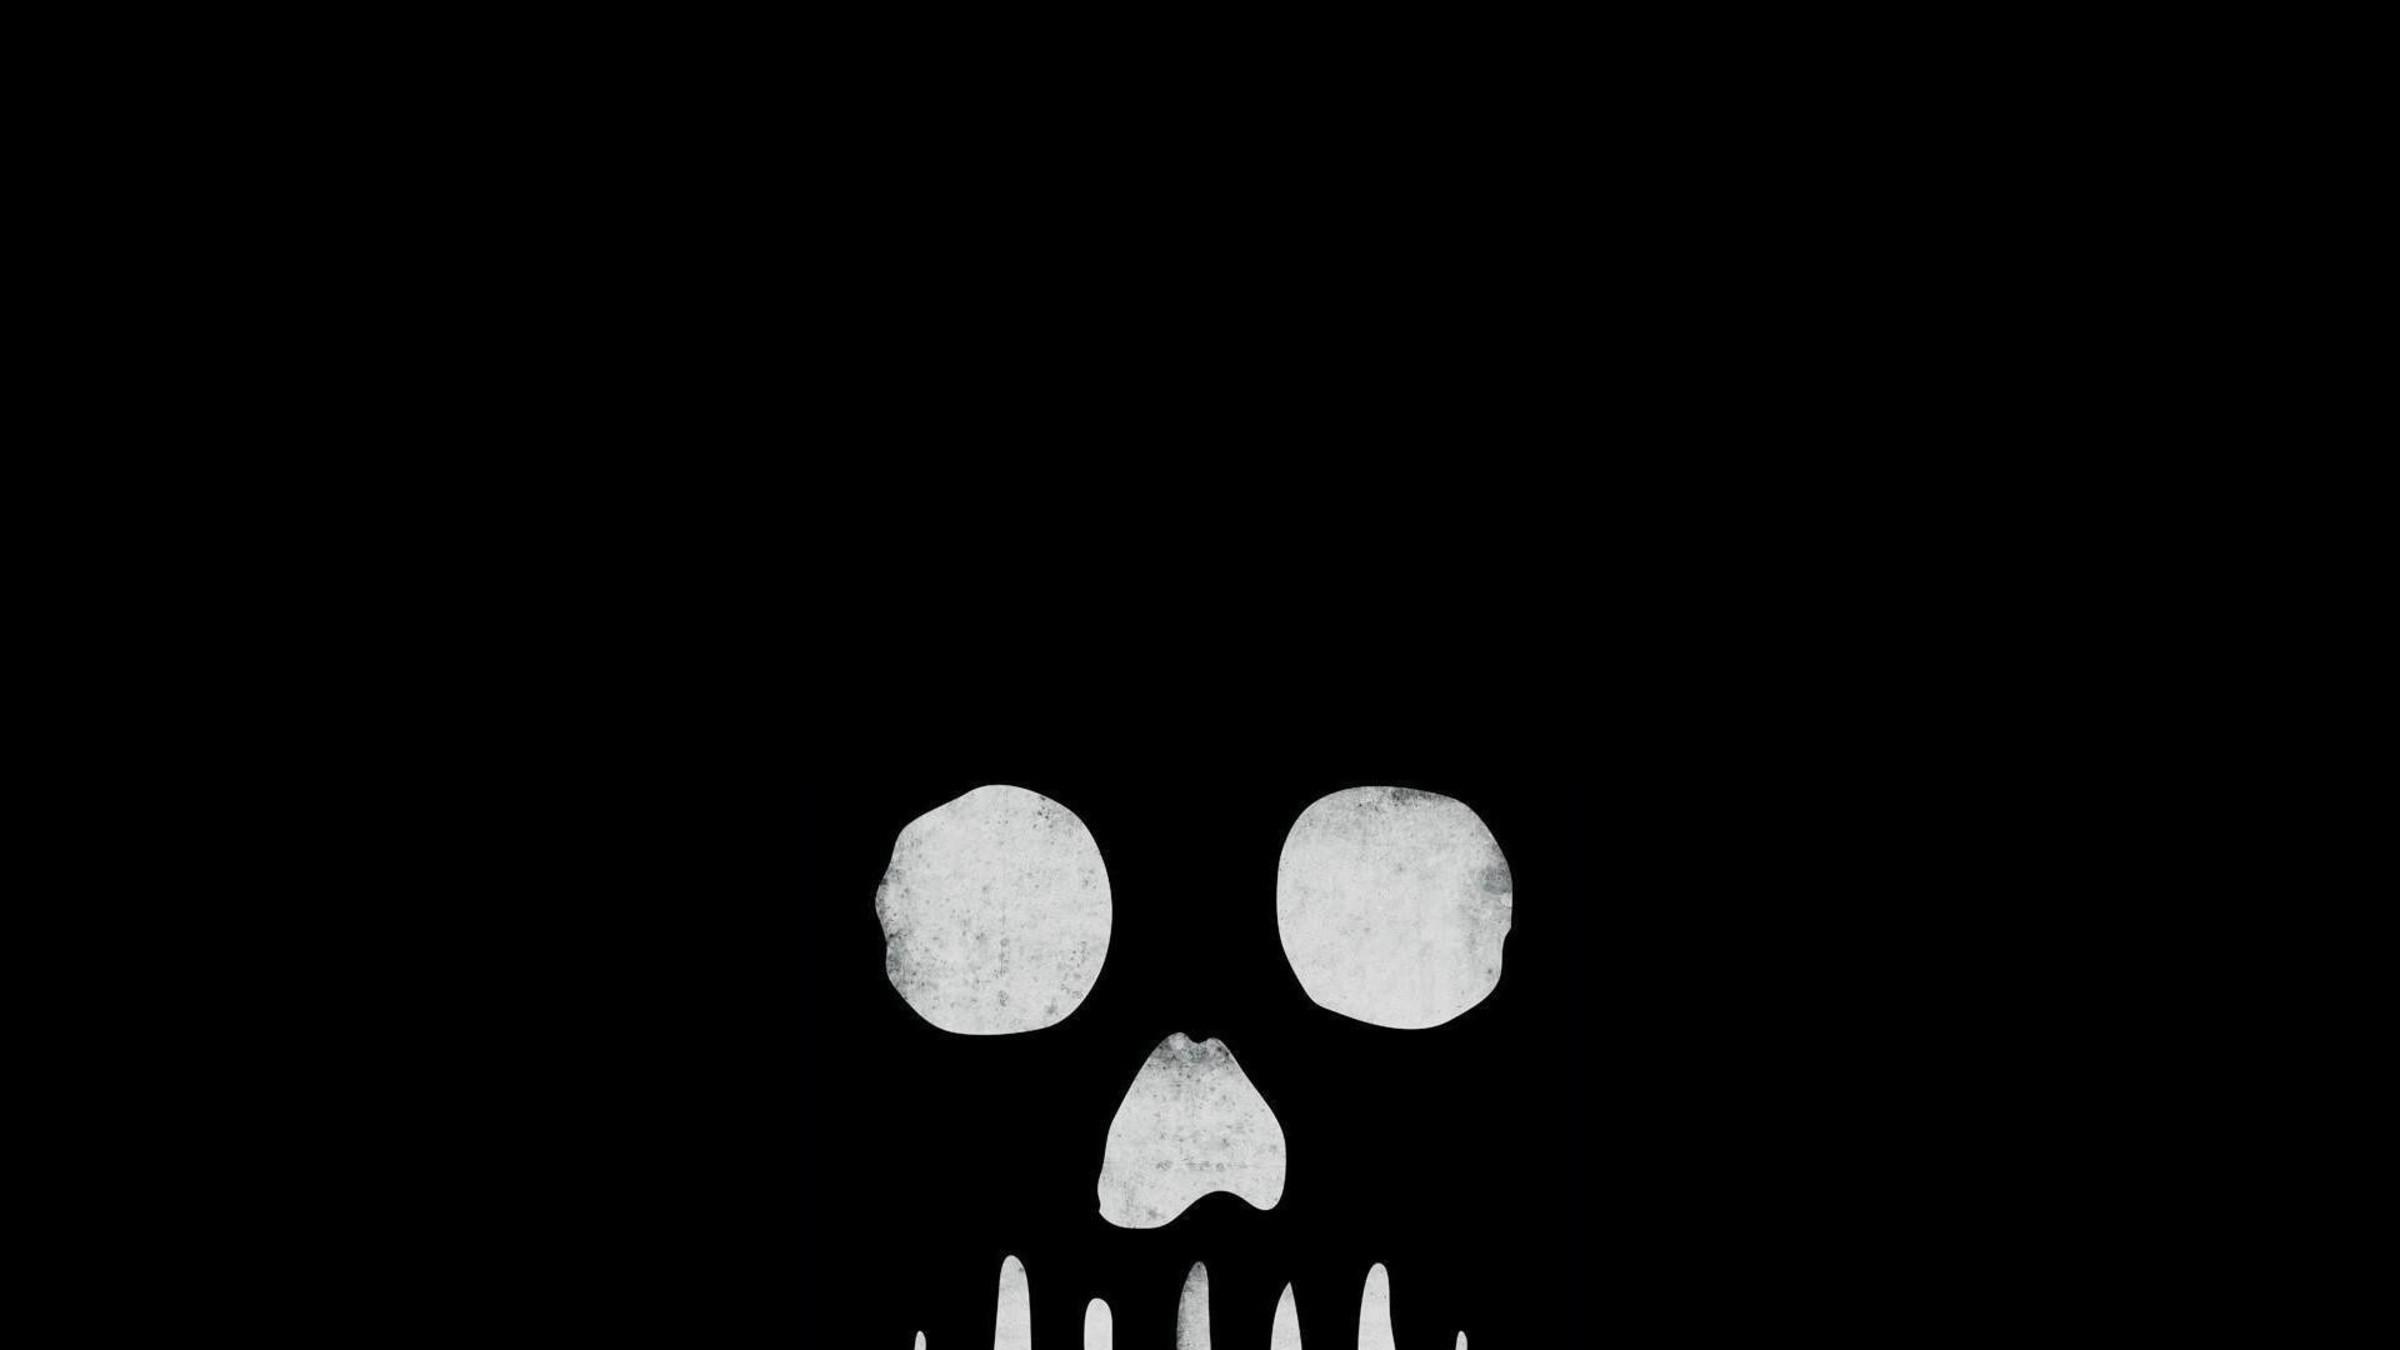 Skull And Bones Wallpaper 63 Images